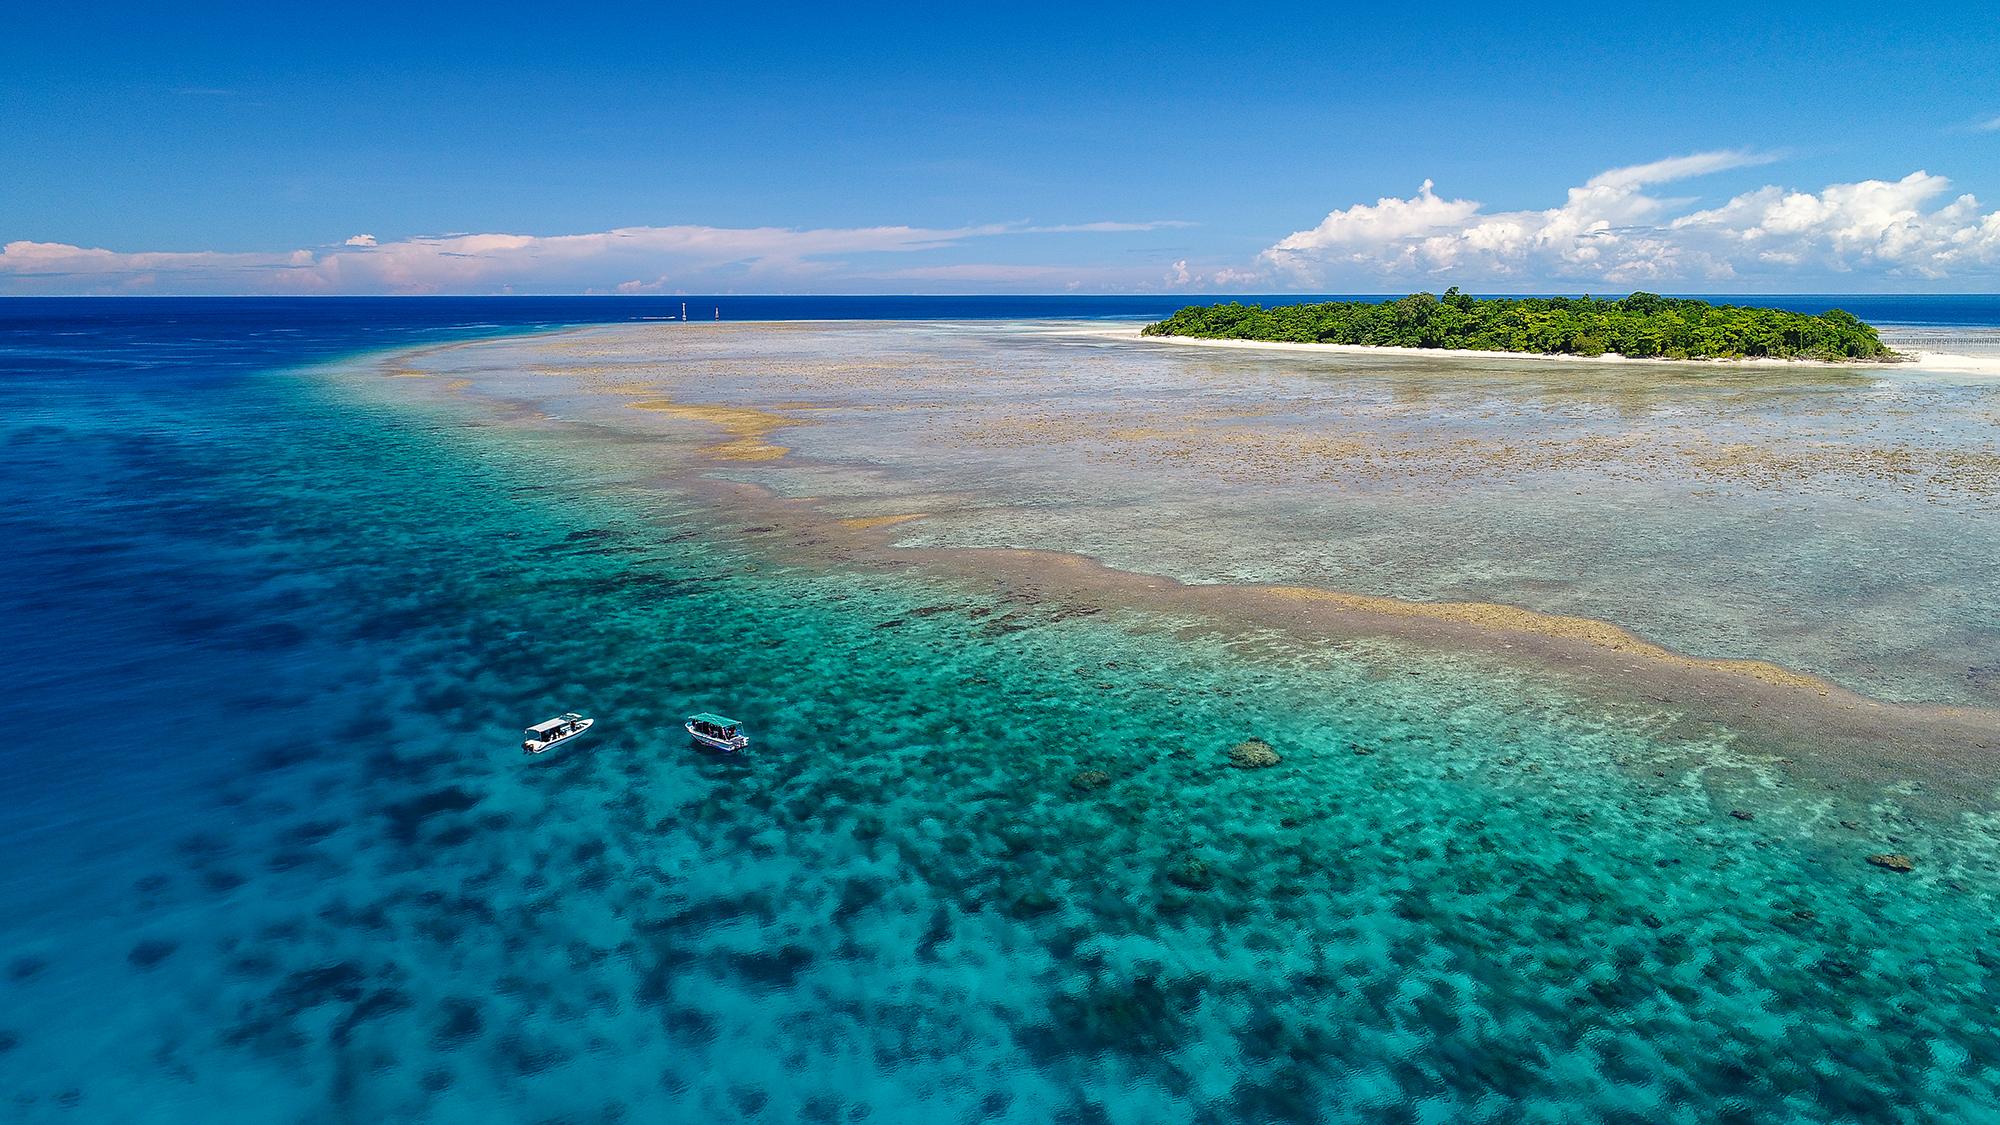 Sangalaki Island, Indonesia CREDIT: SIMON J. PIERCE / coral reef image bank